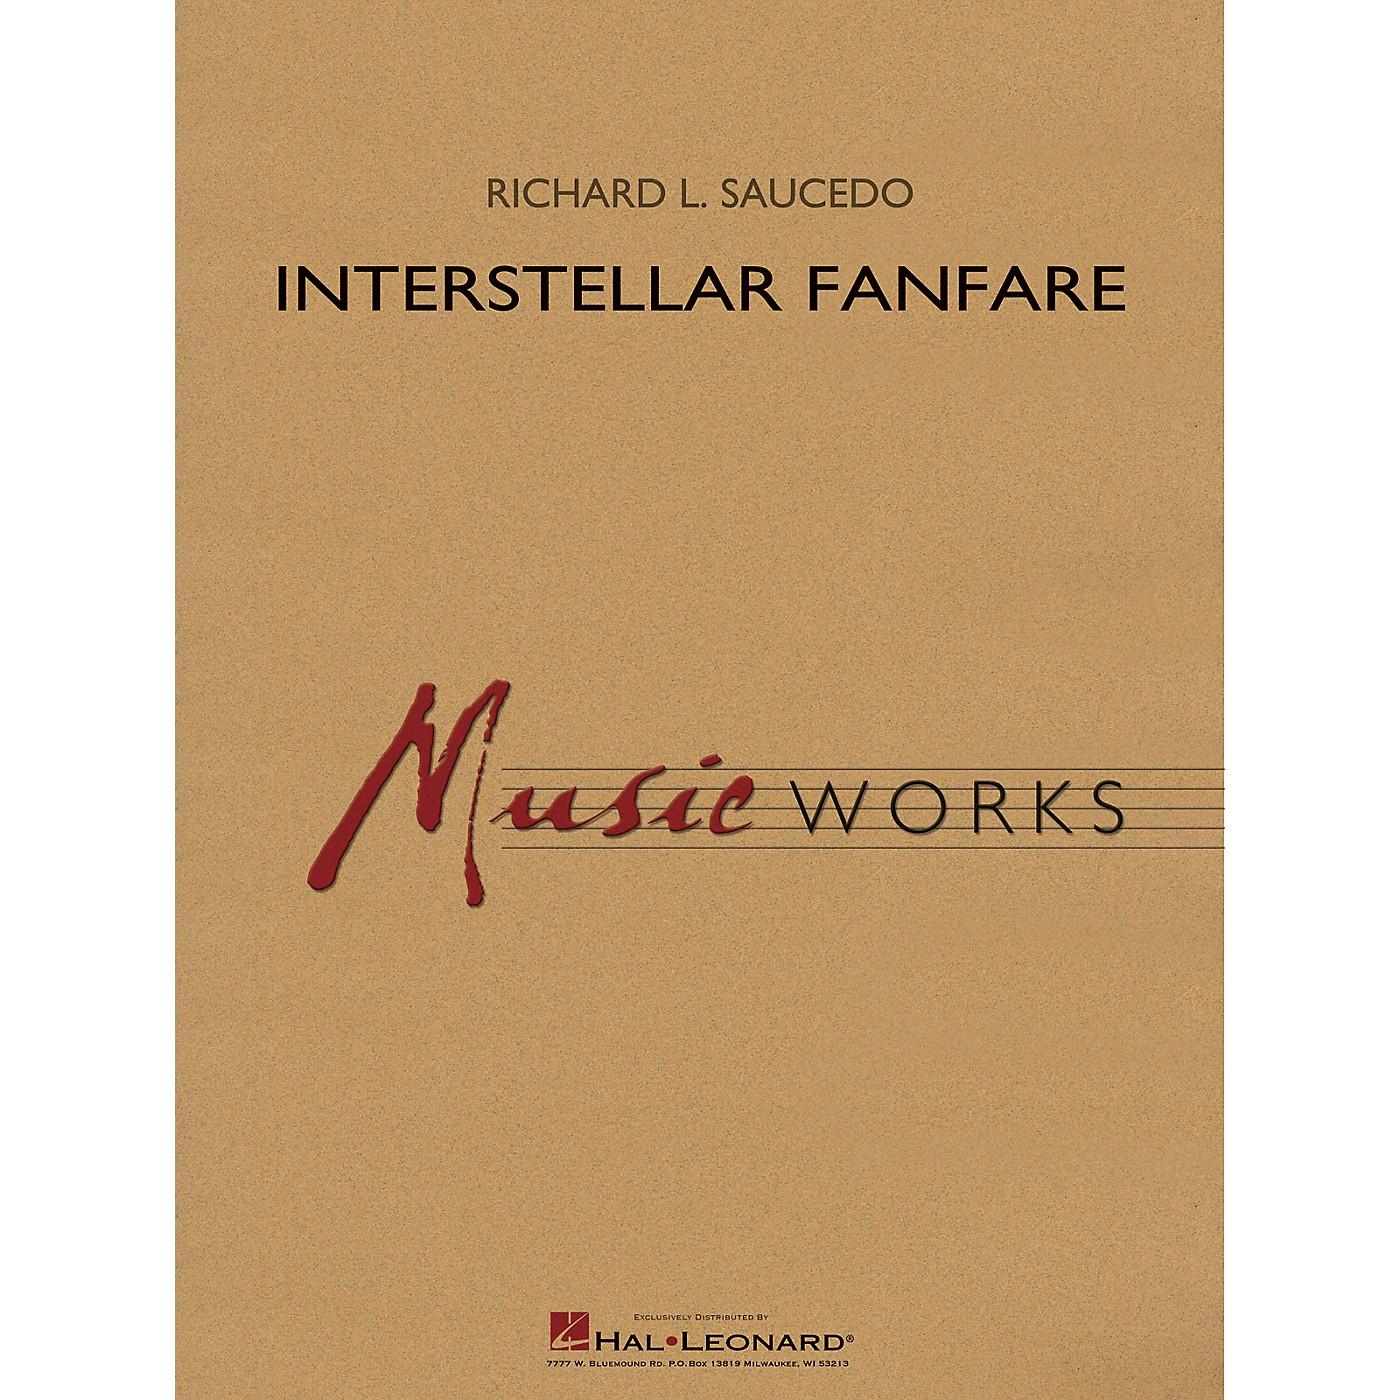 Hal Leonard Interstellar Fanfare Concert Band Level 4 composed by Richard L. Saucedo thumbnail